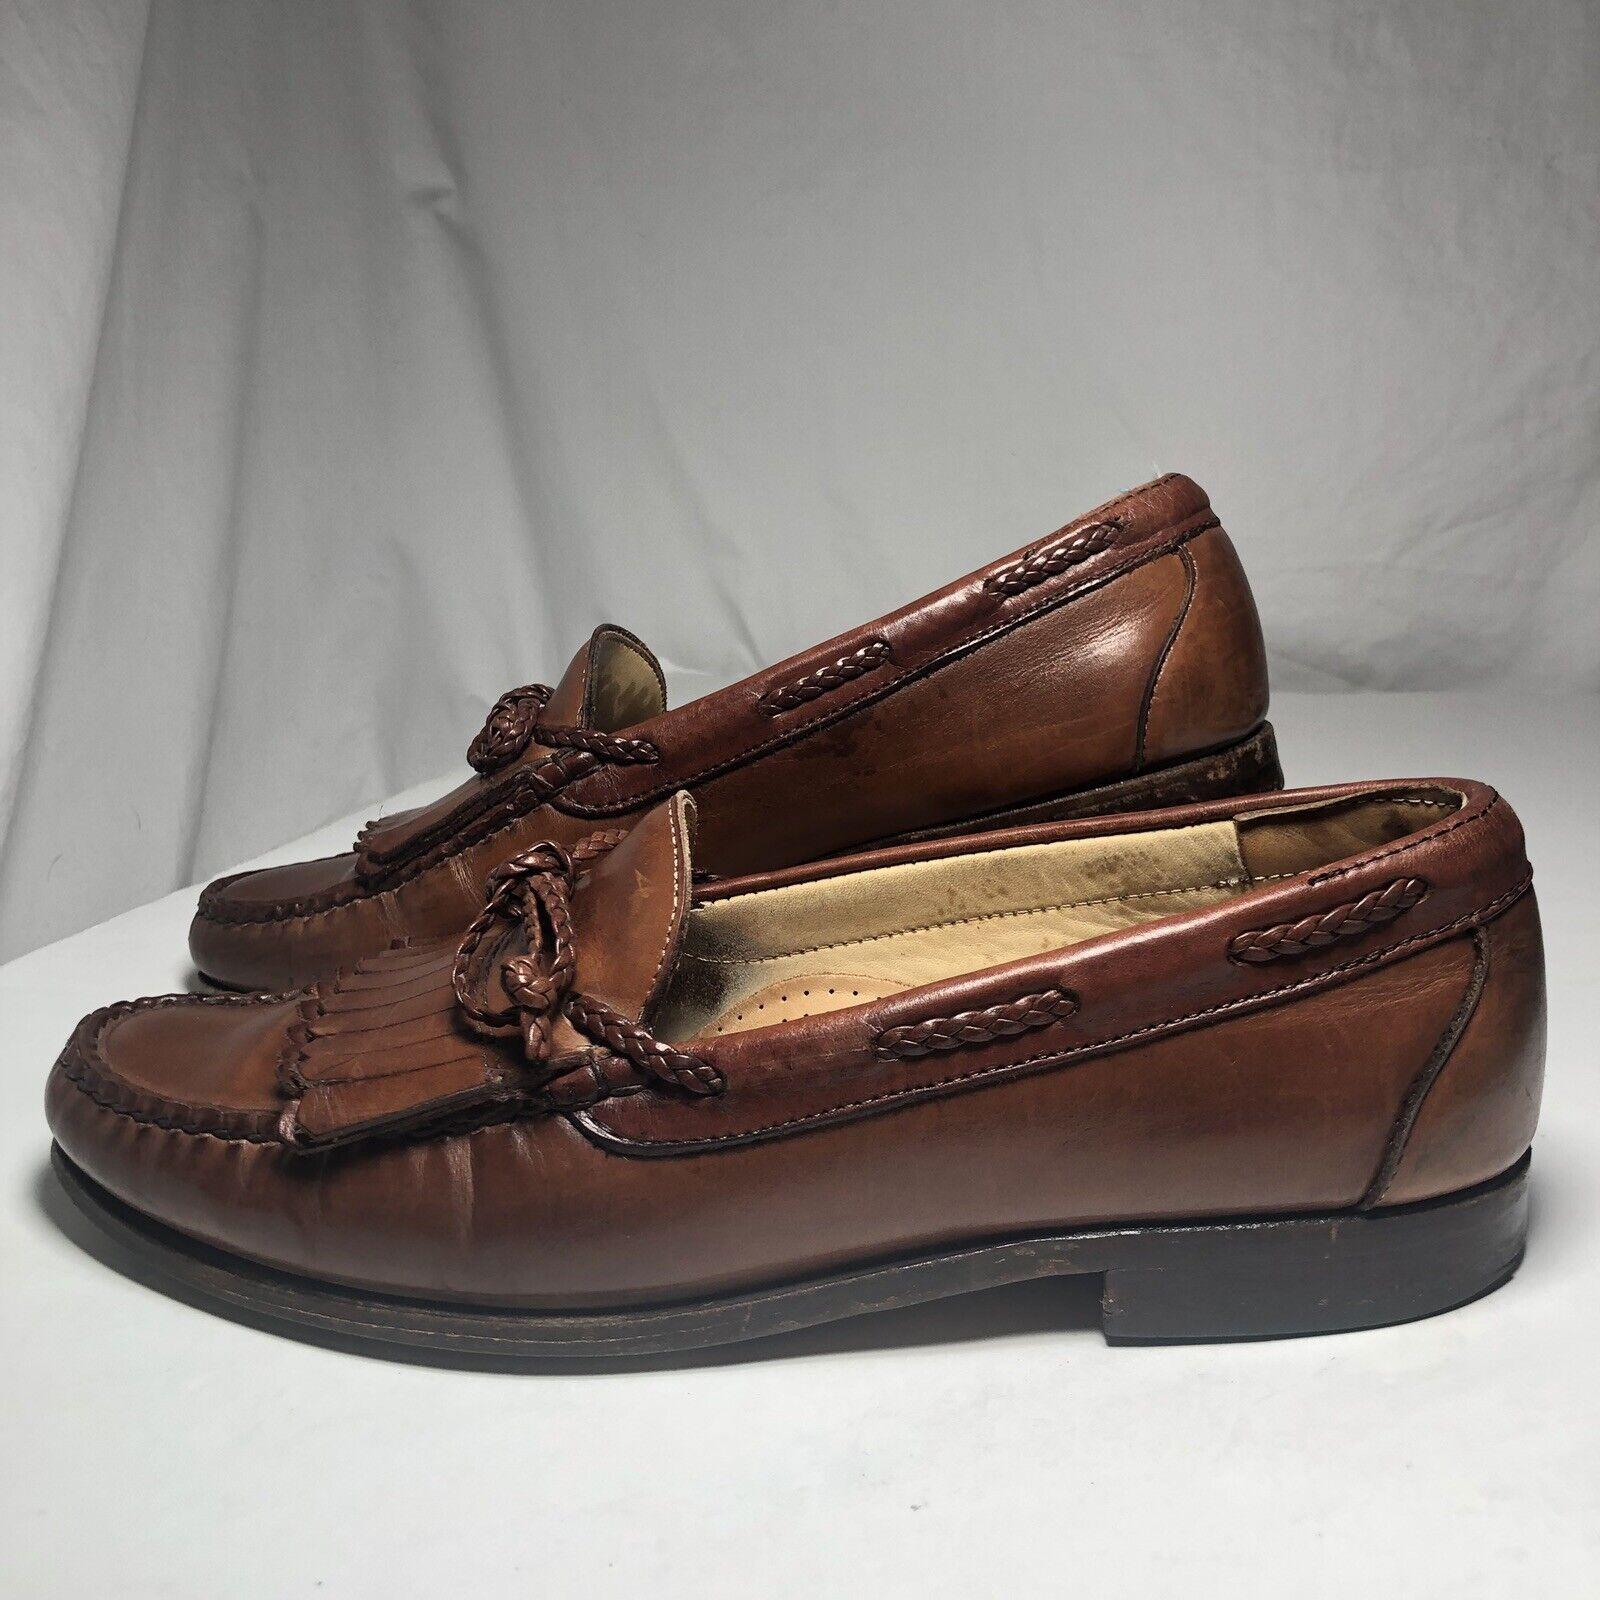 tuttien Edmonds Woodstock Marronee Leather Braided String Loafers 47213 sautope 10 C Sautope classeiche da uomo